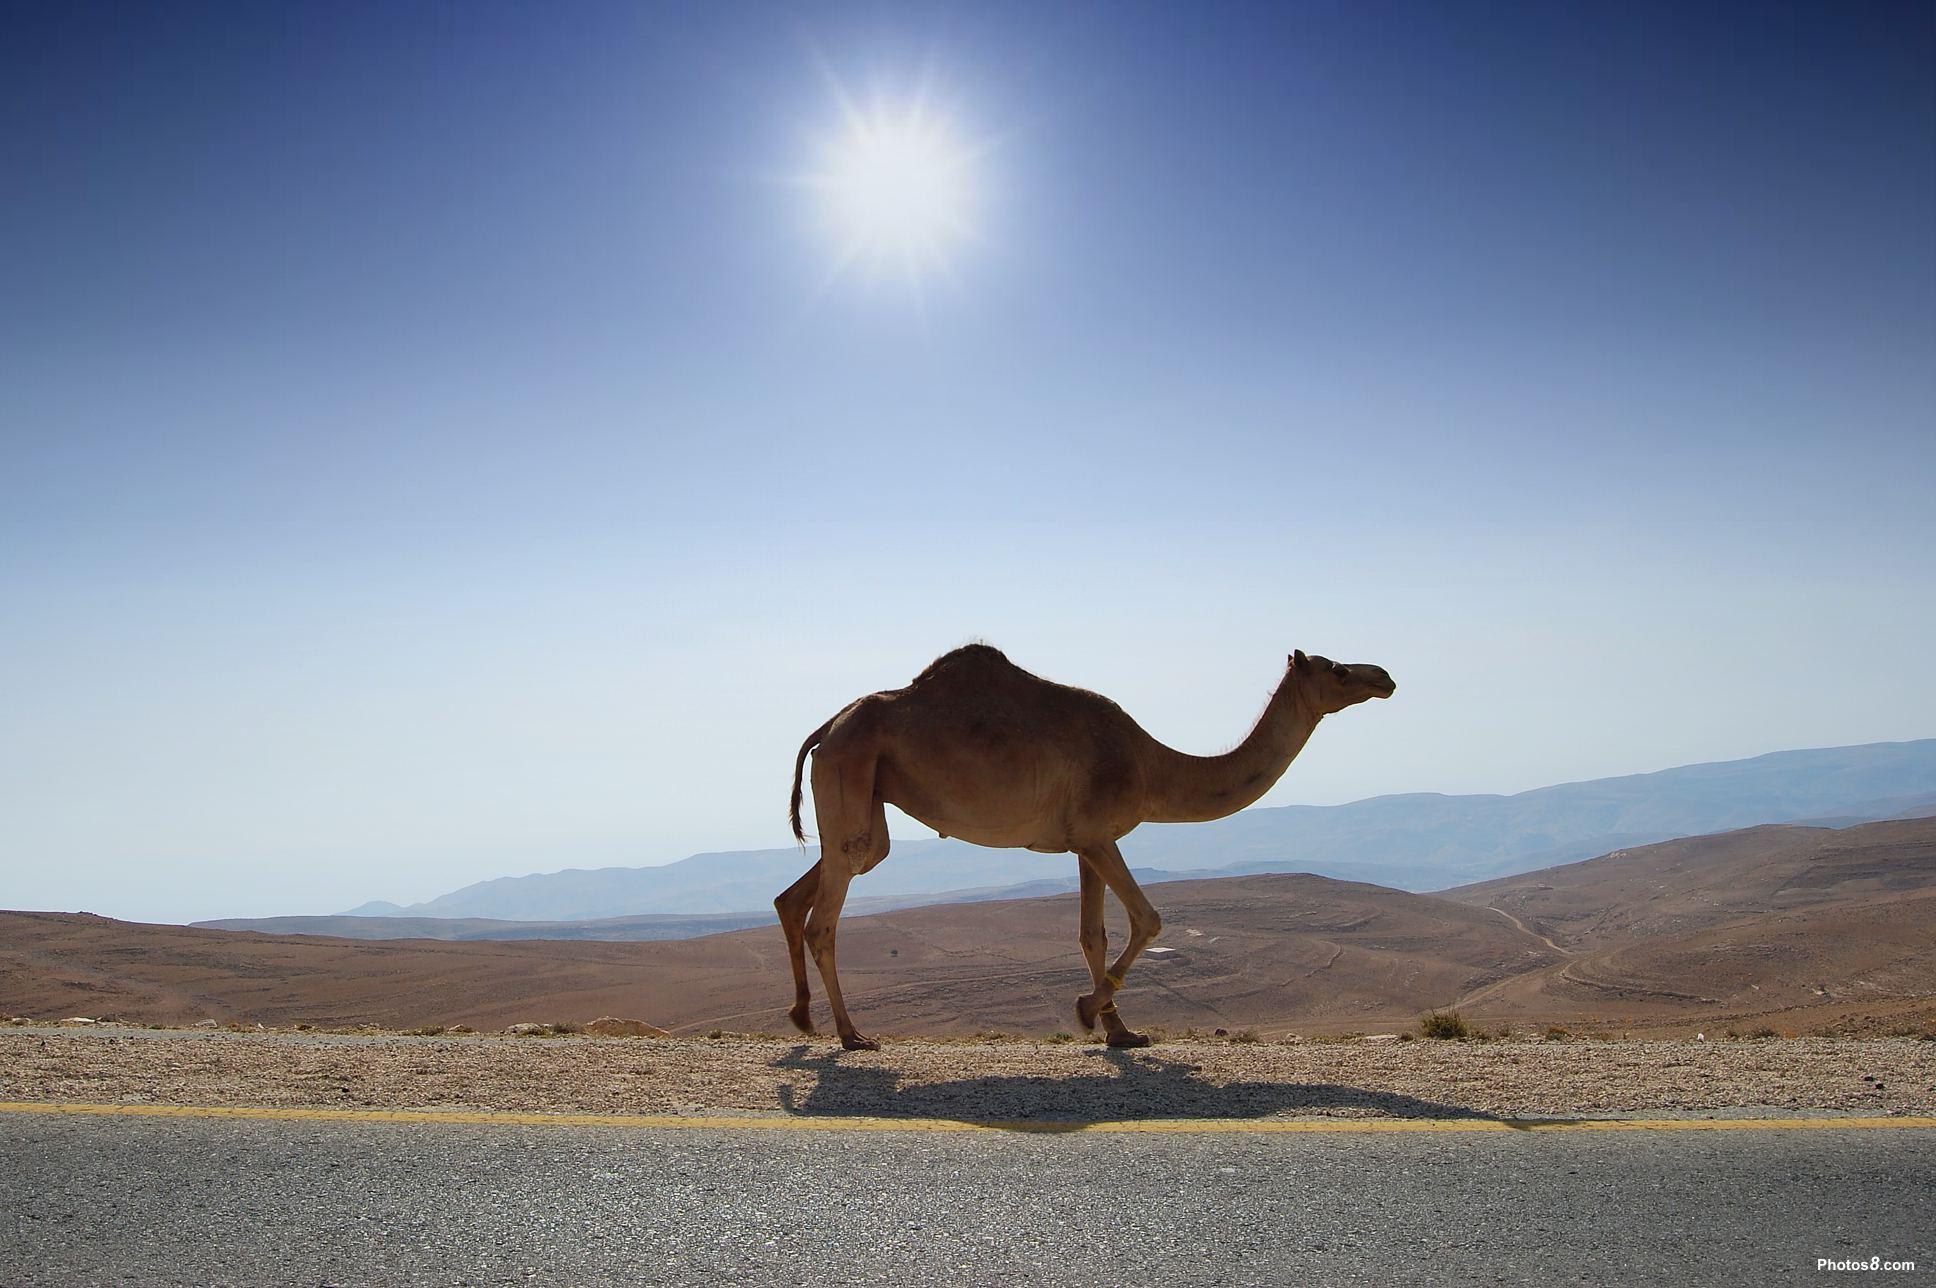 Desert Camel Wallpapers Top Free Desert Camel Backgrounds